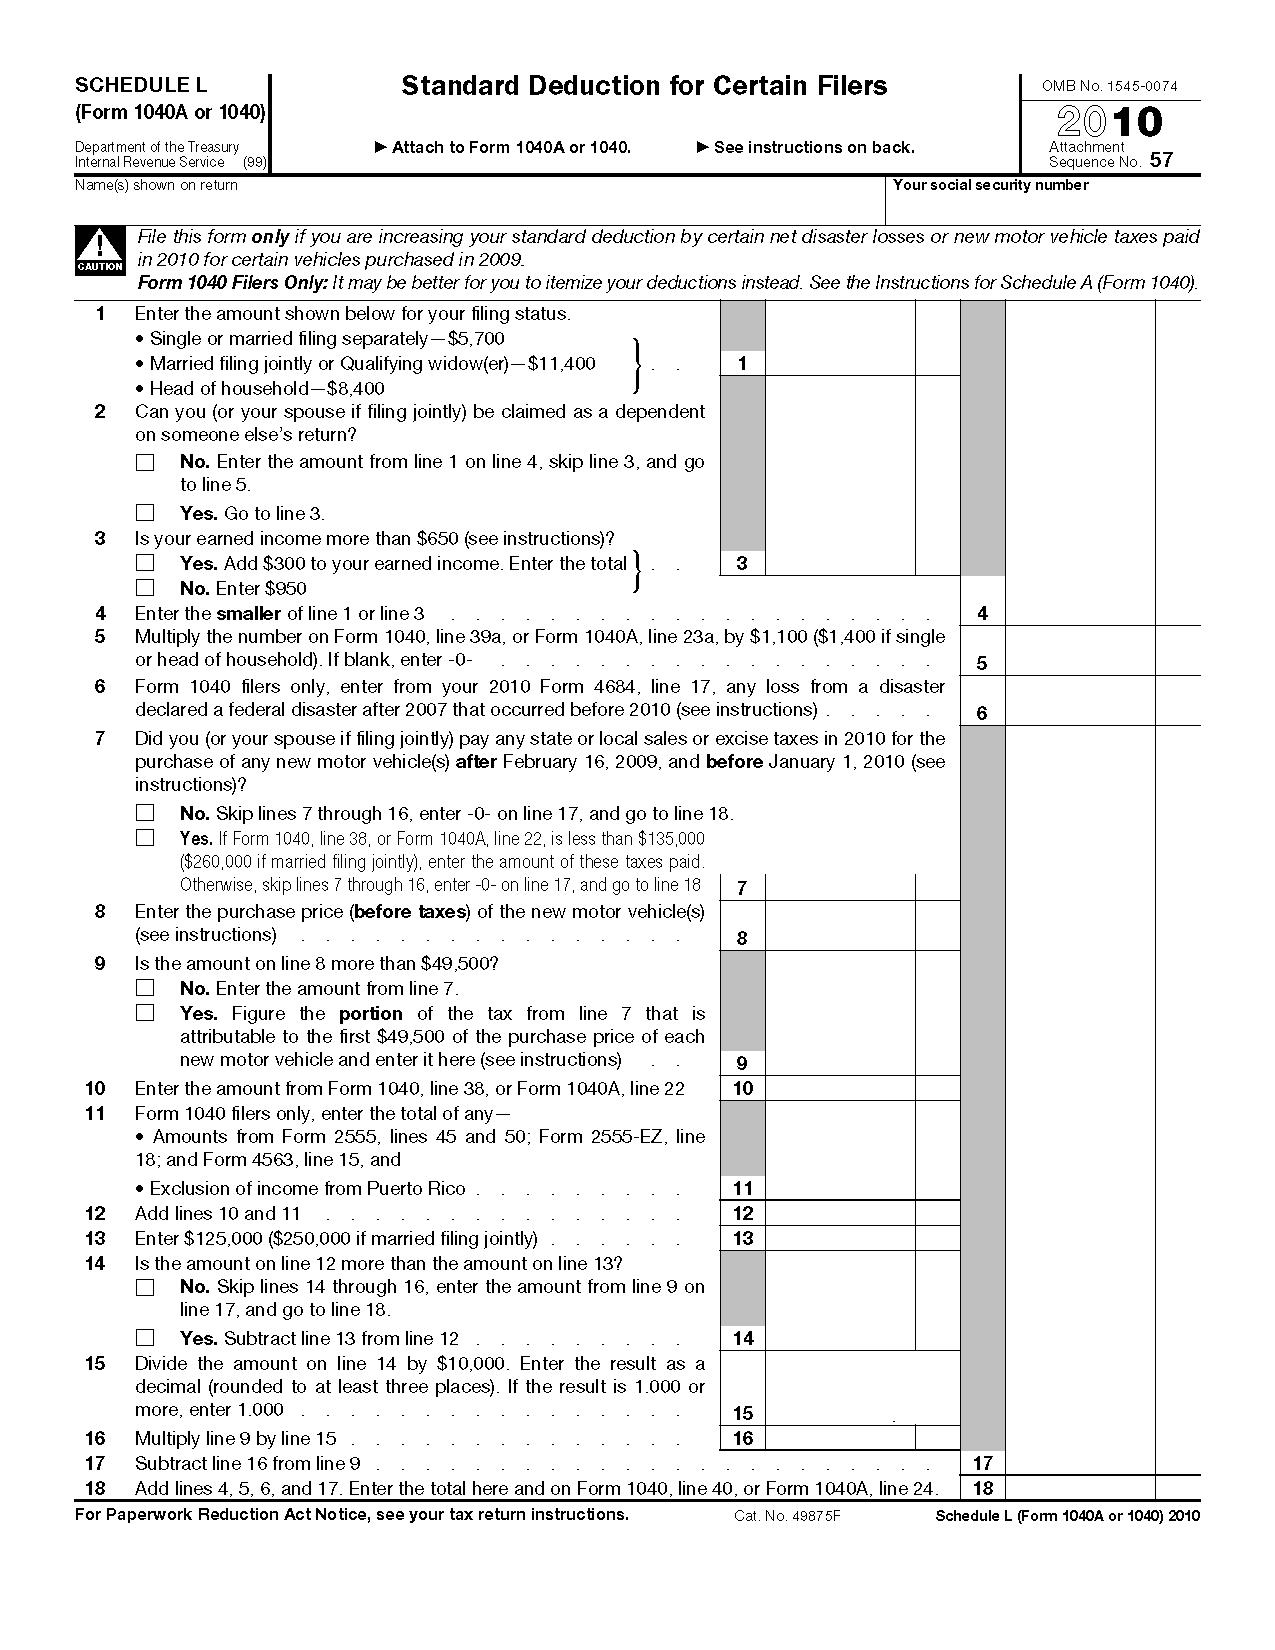 Form Schedule L Standard Deduction For Certain Filers